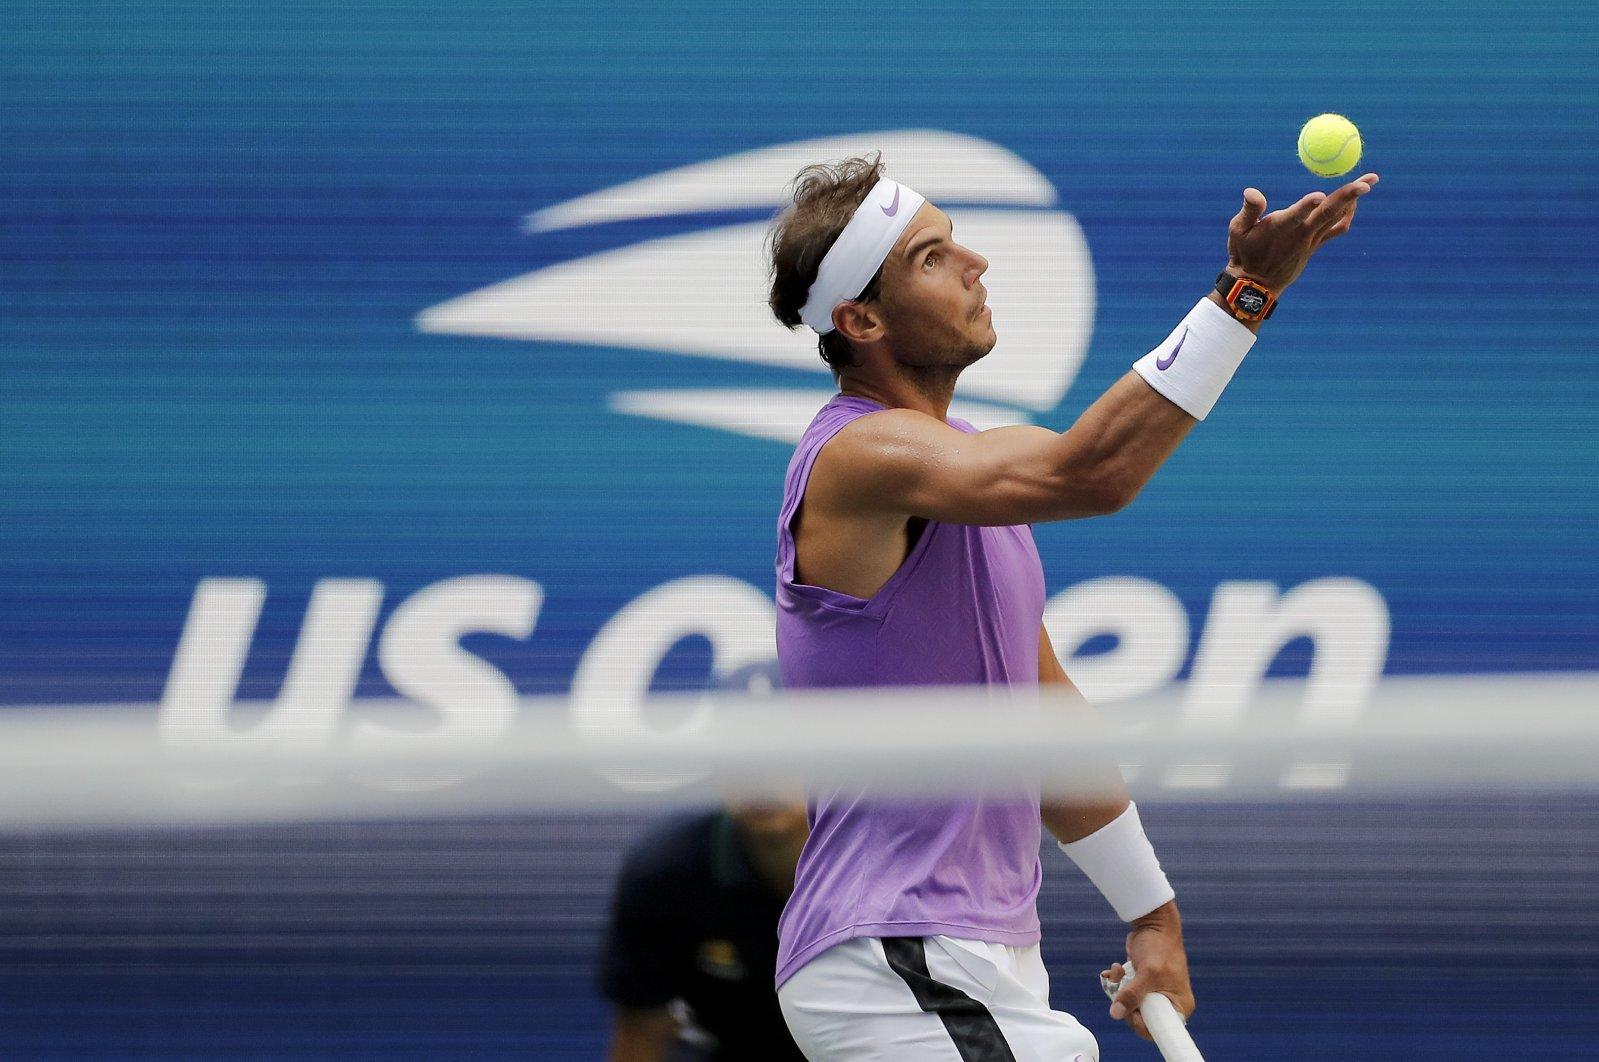 Rafael Nadal serves to Hyeon Chung during the U.S. Open tennis championships, New York, U.S., Aug. 31, 2019. (AP Photo)